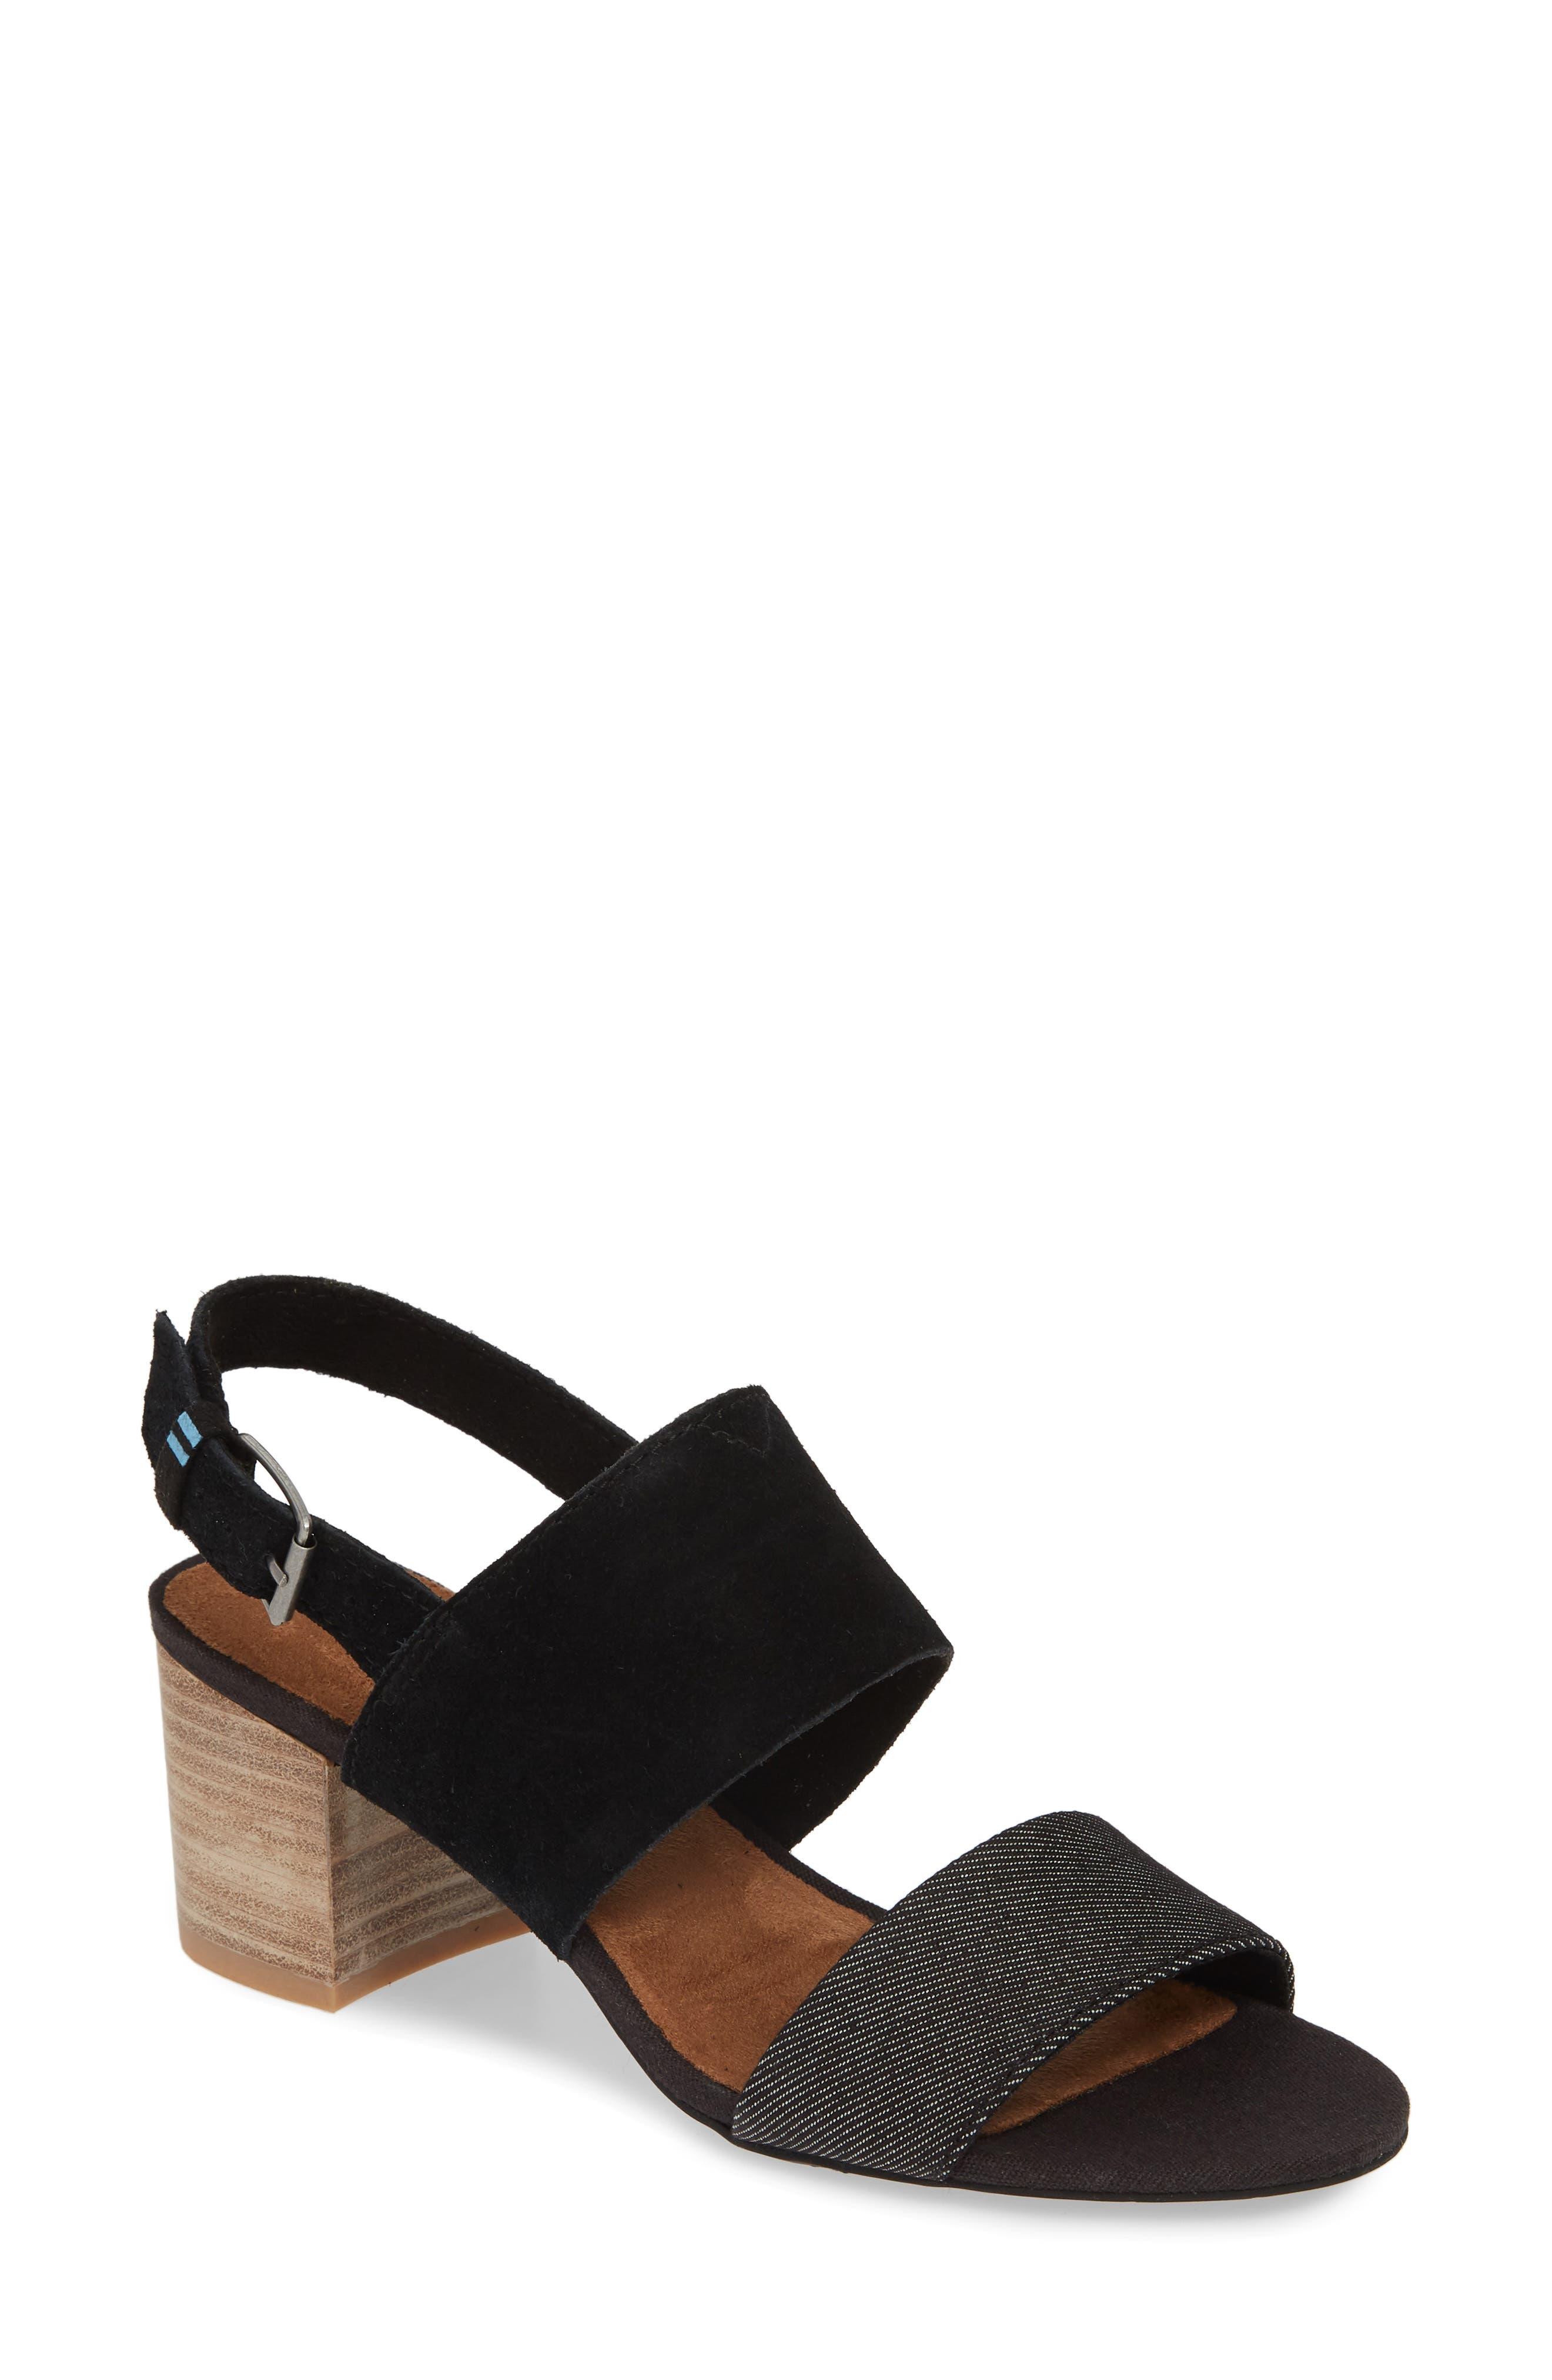 Poppy Sandal, Main, color, BLACK/ BLACK SUEDE